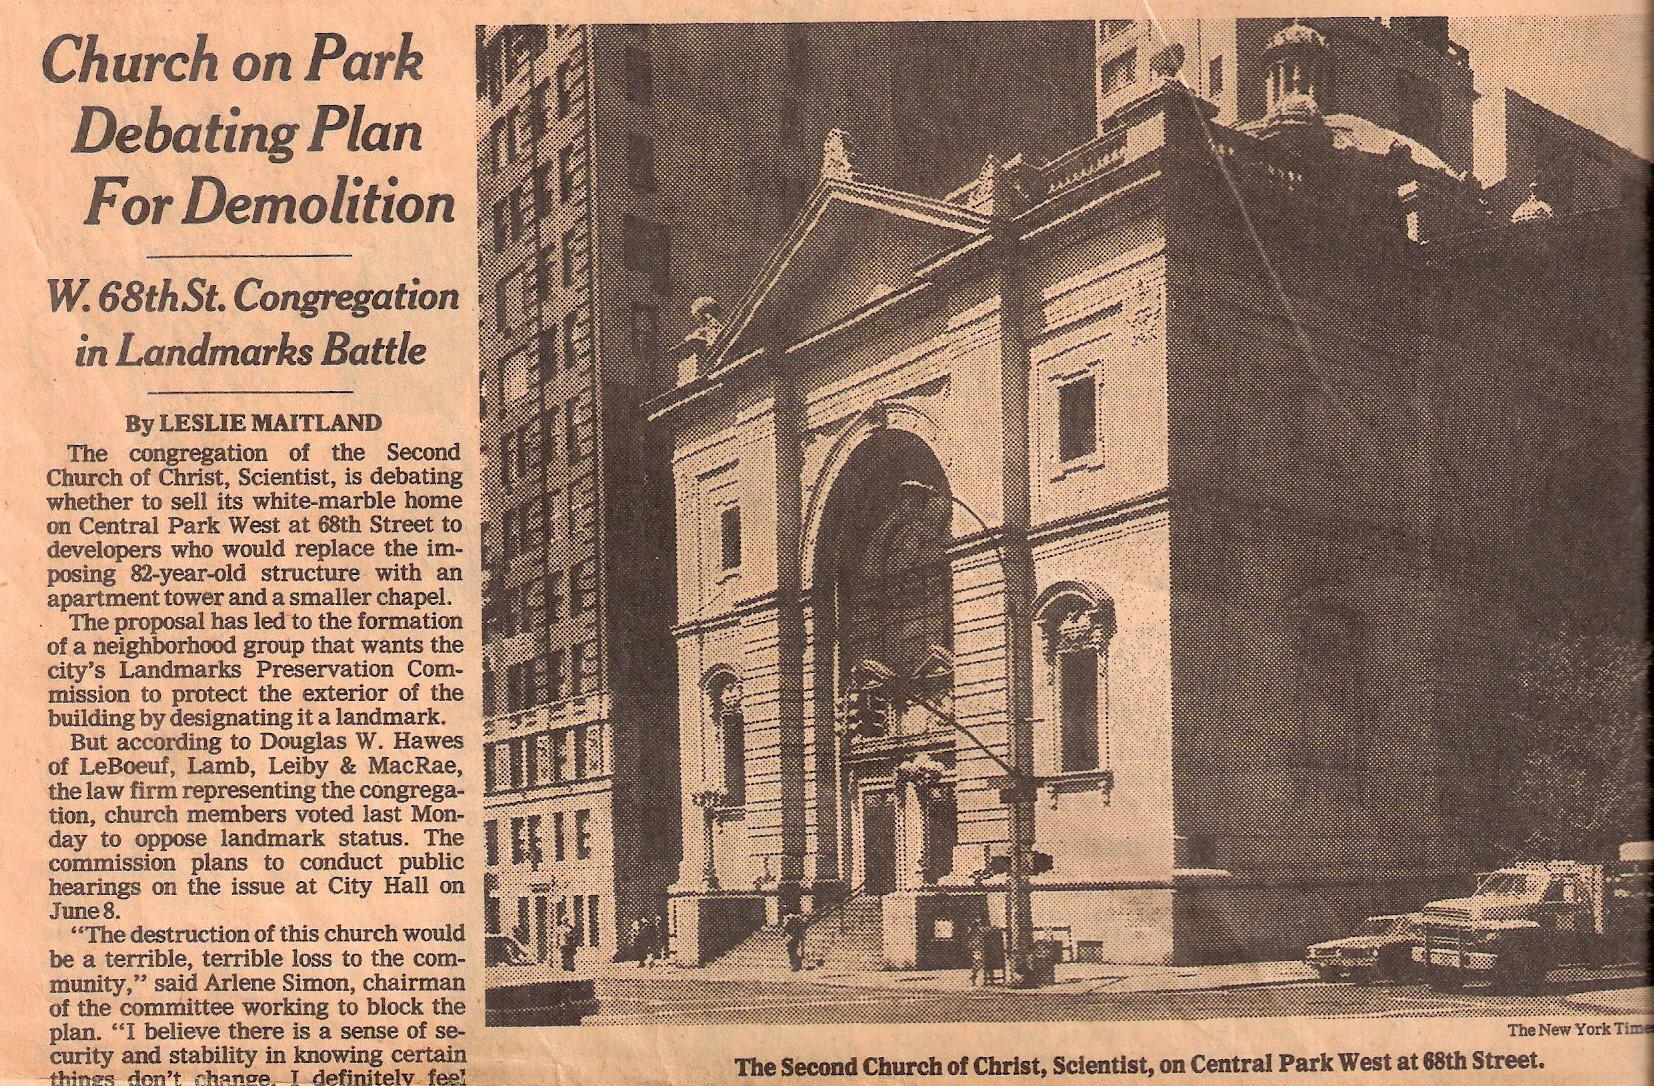 Church on Park Debating Plans for Demolition